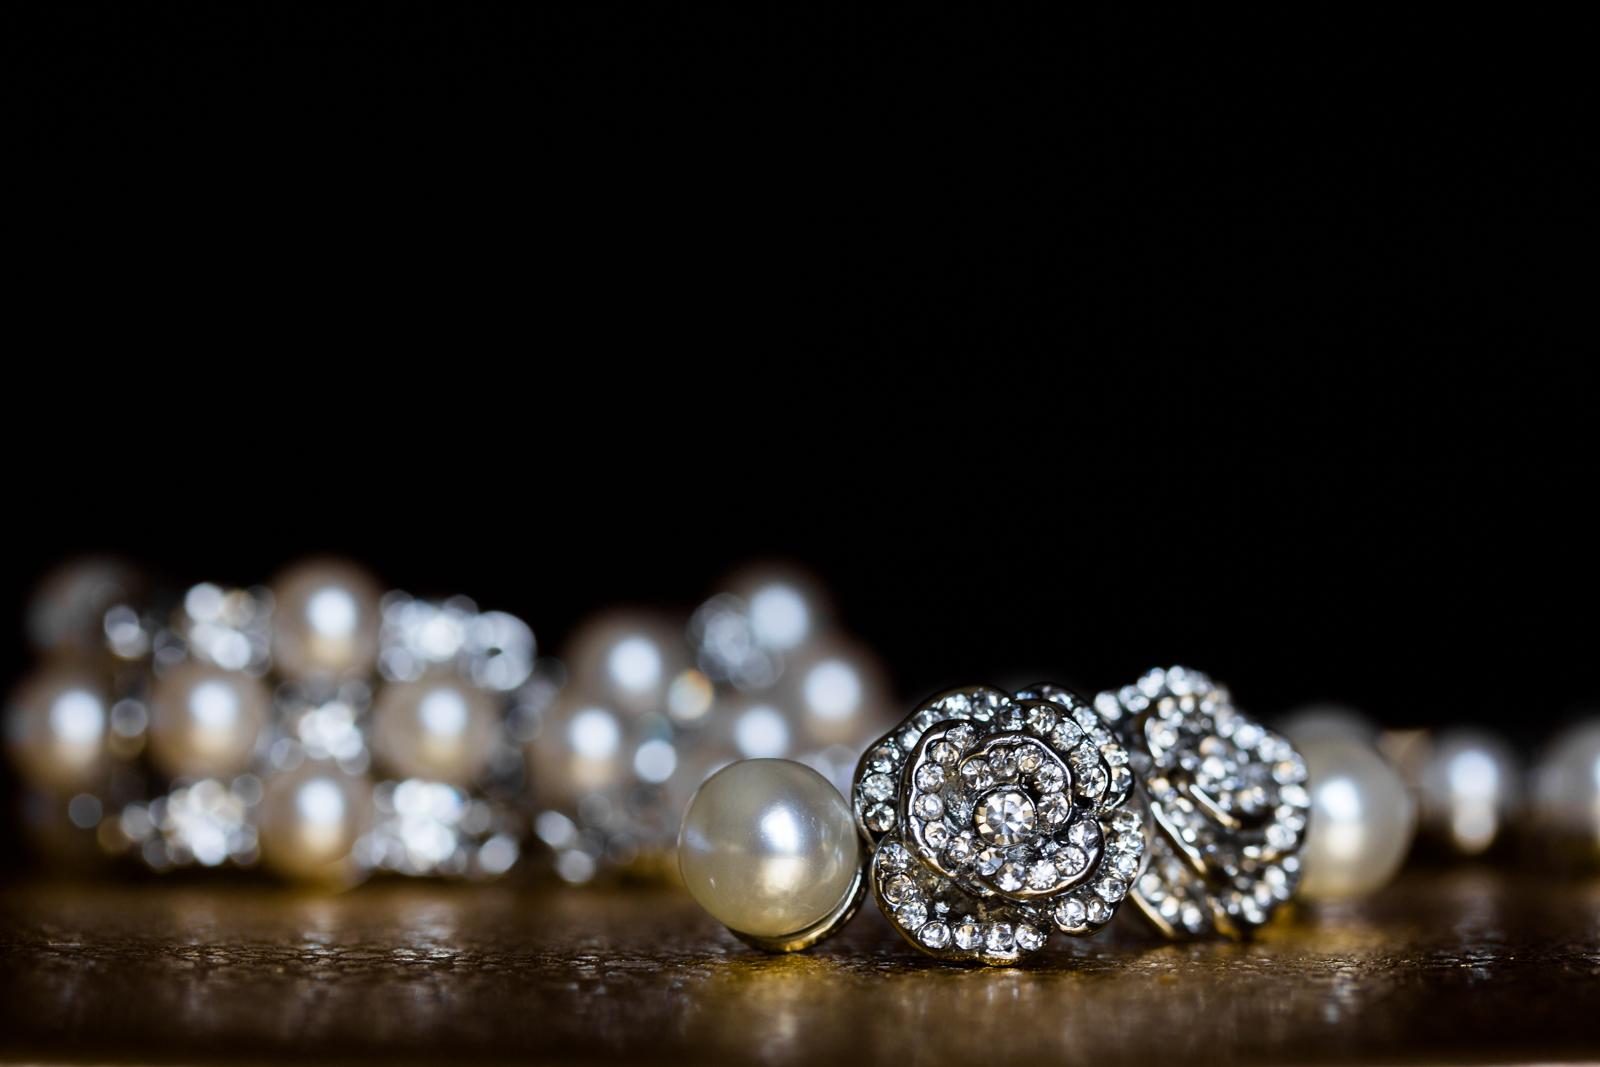 naperville-wedding-photography-4.jpg